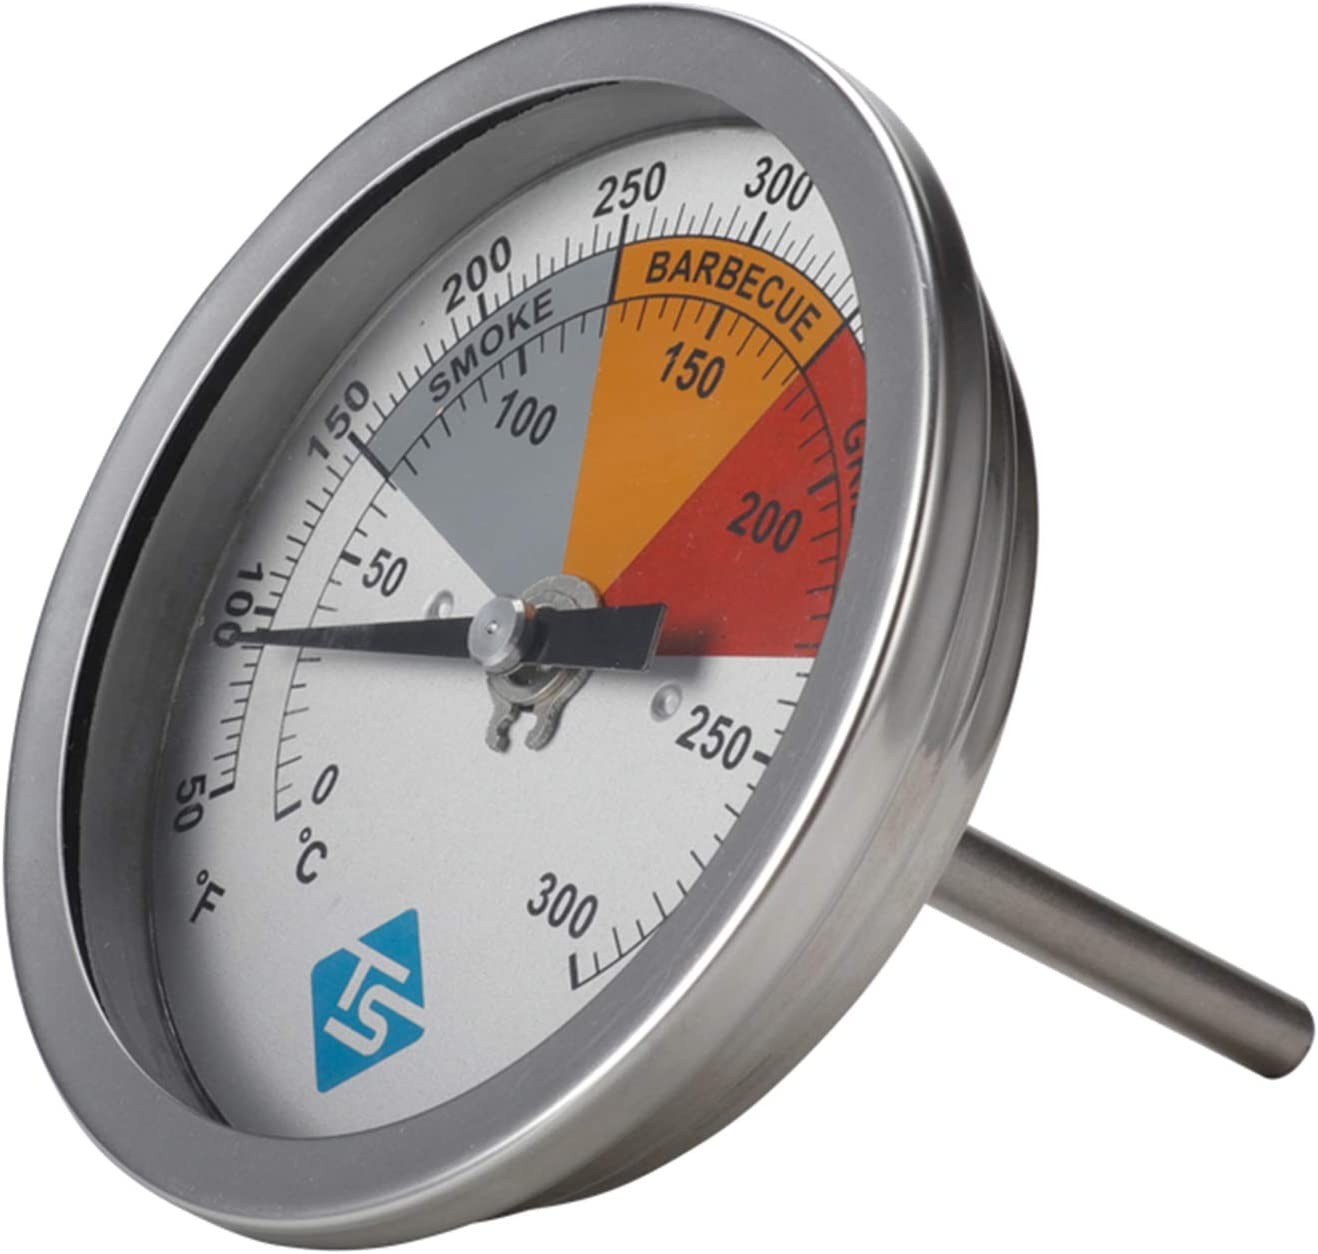 zrshygs BBQ Smoker Thermometer Analoges Temperaturmessger/ät f/ür Holzkohlegrillgrube 50-550 F.